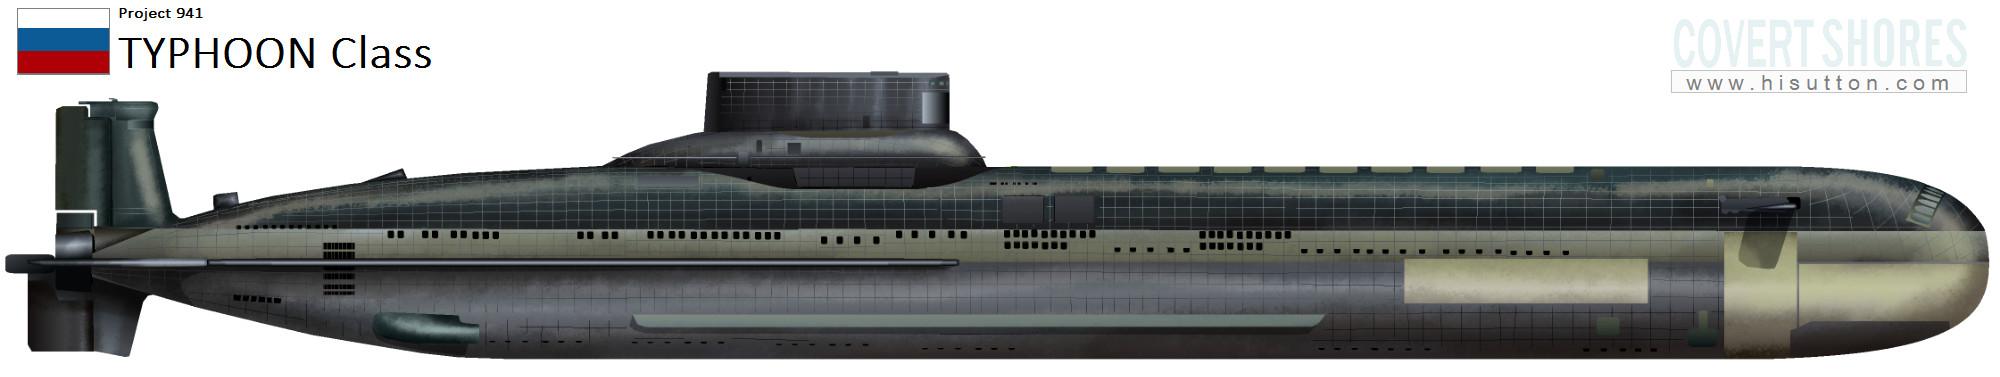 typhoon class submarine size comparison hunthankkco